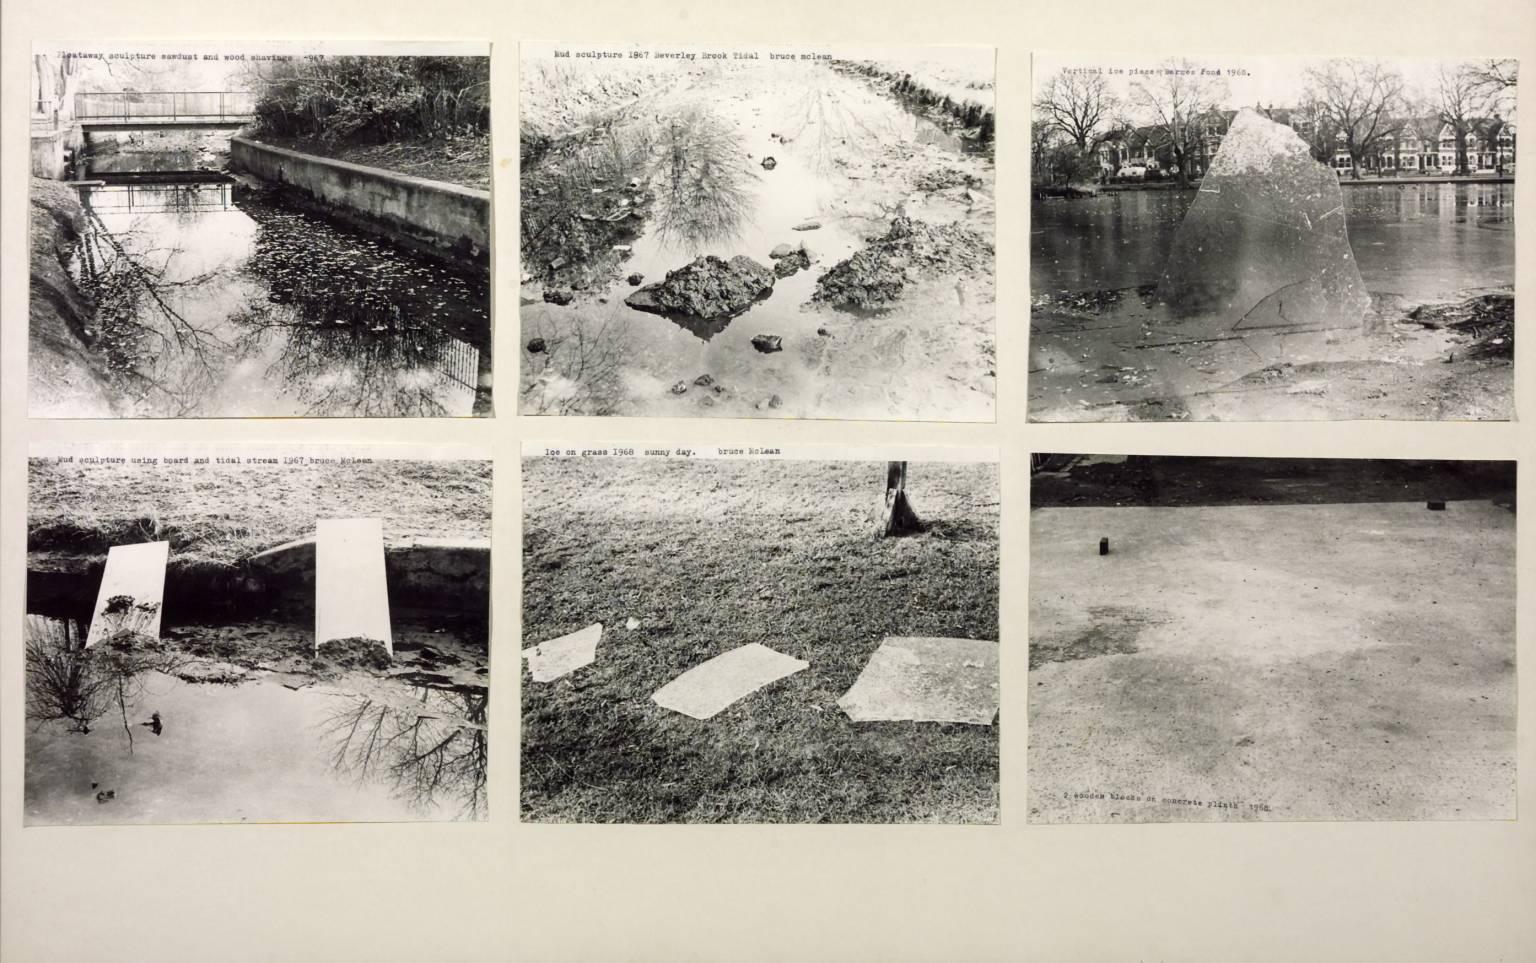 Six Sculptures 1967-8 by Bruce McLean born 1944